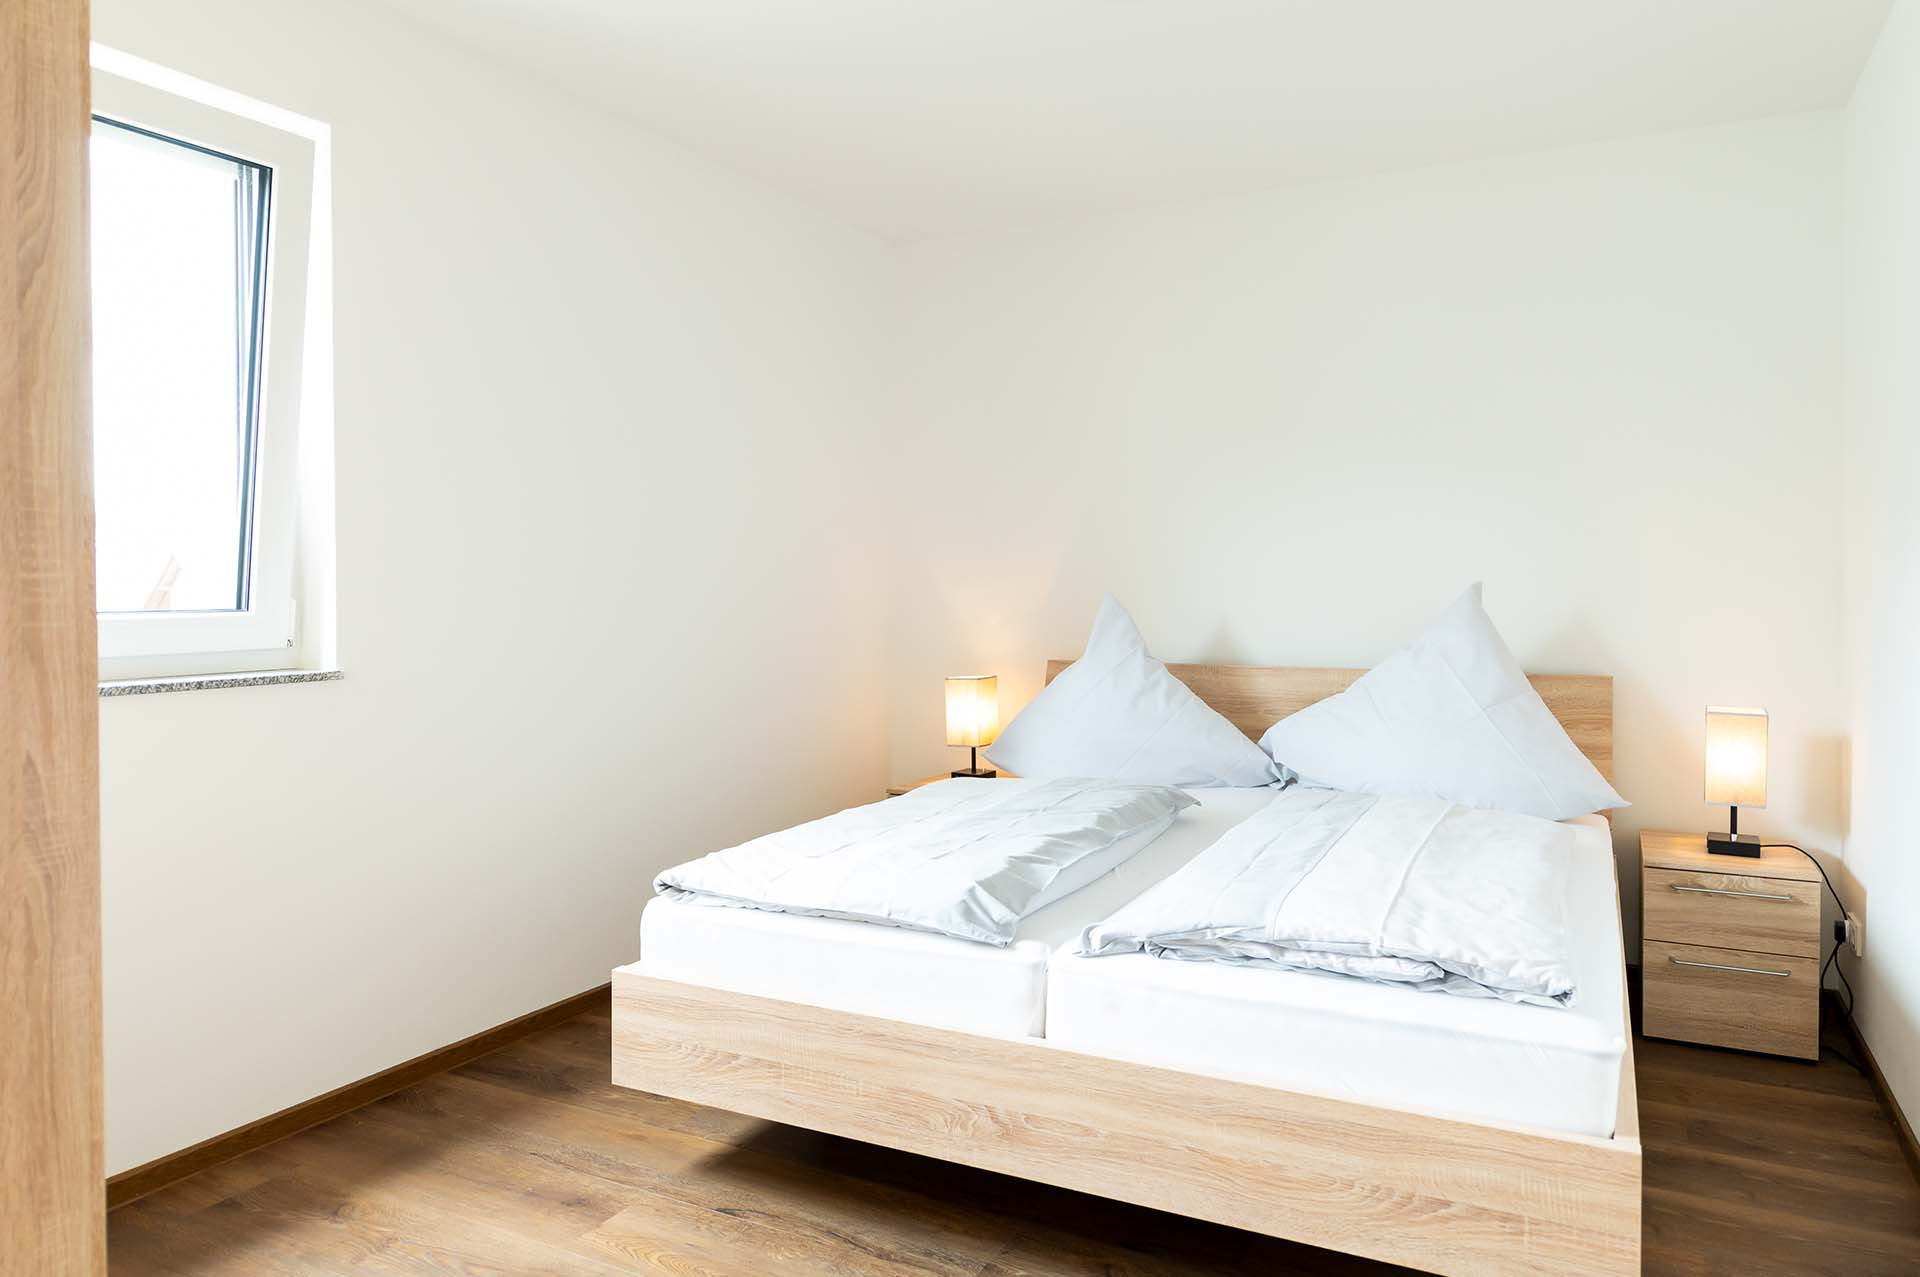 appartement-mettlach-alter-turm-doppelbett